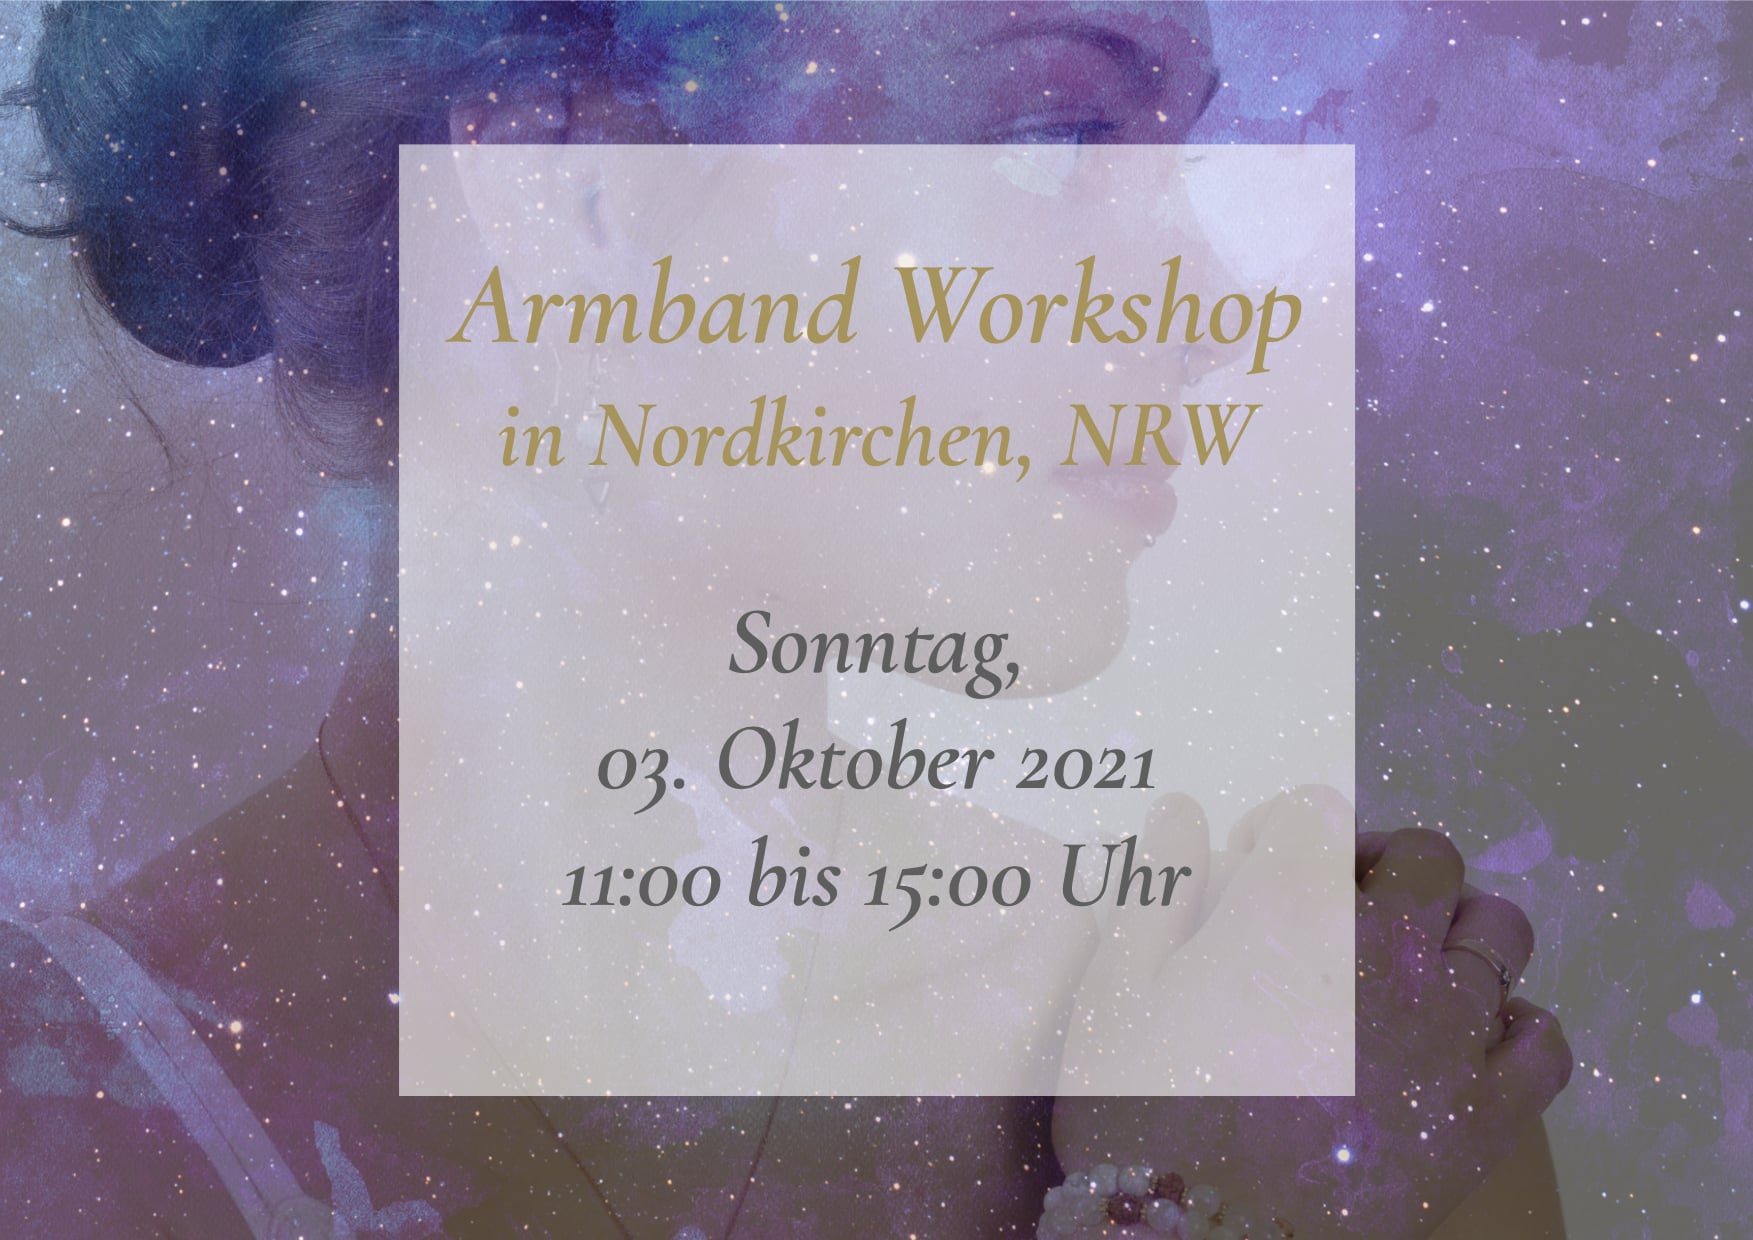 NW_Armband_WS_03_10_21_EN